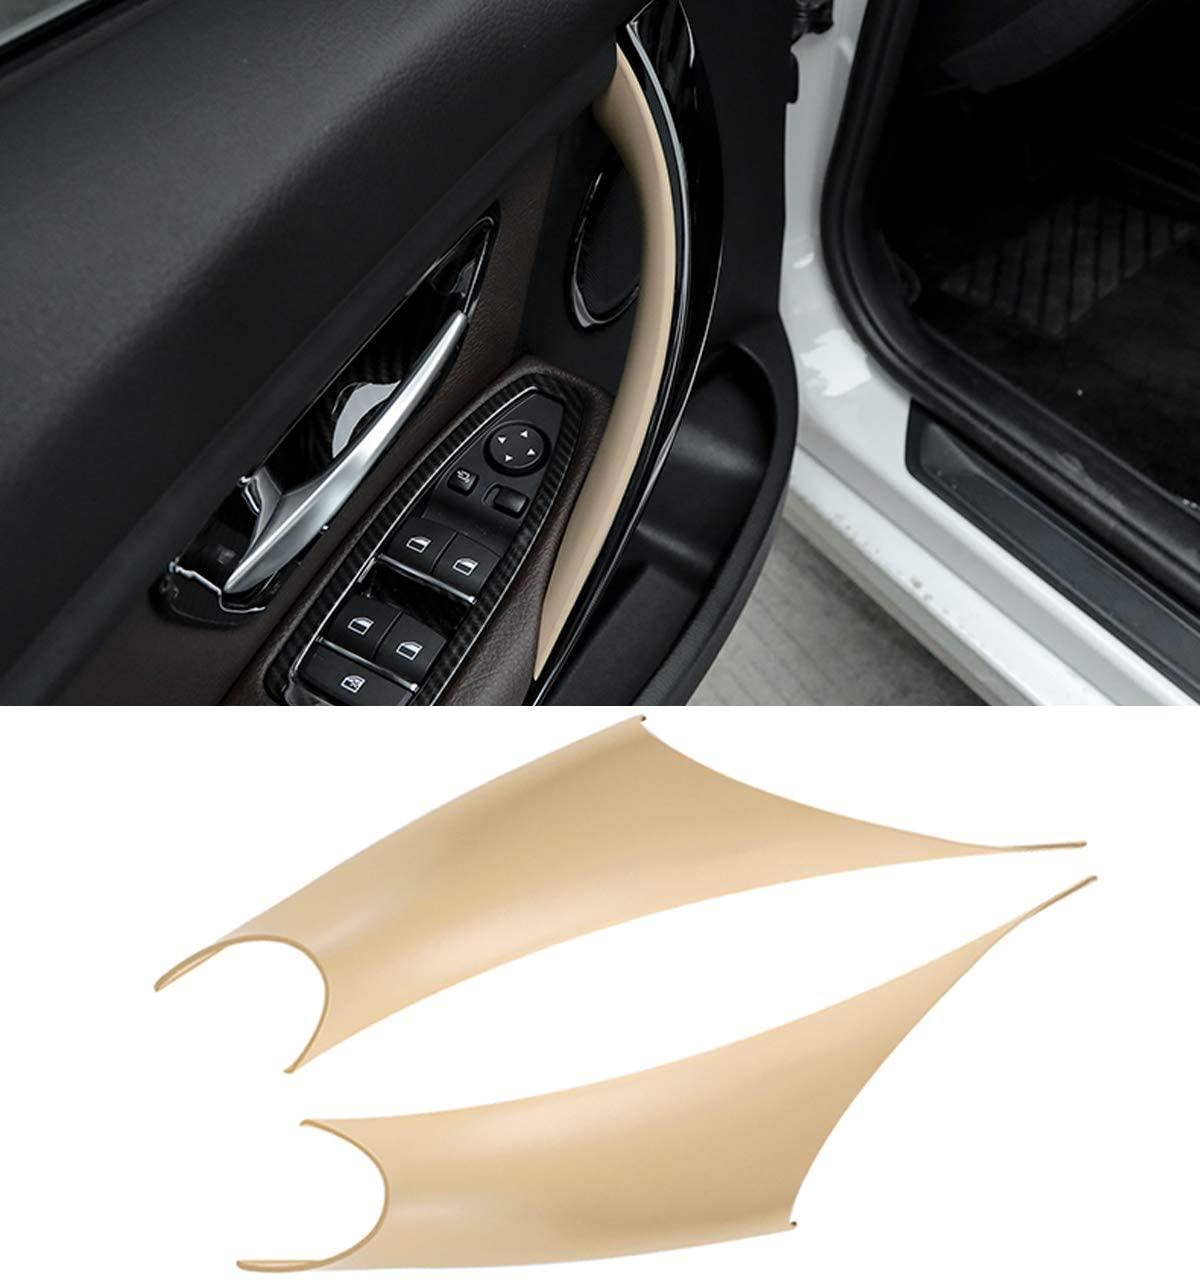 Jaronx 2PCS Door Handle Covers for BMW 3 Series 4 Series Driver Side & Passenger Side Door Pull Handle Covers (for:BMW 320i,328i,330i,335i F30/F31 and BMW 428i, 435i F32/F36)(Beige)